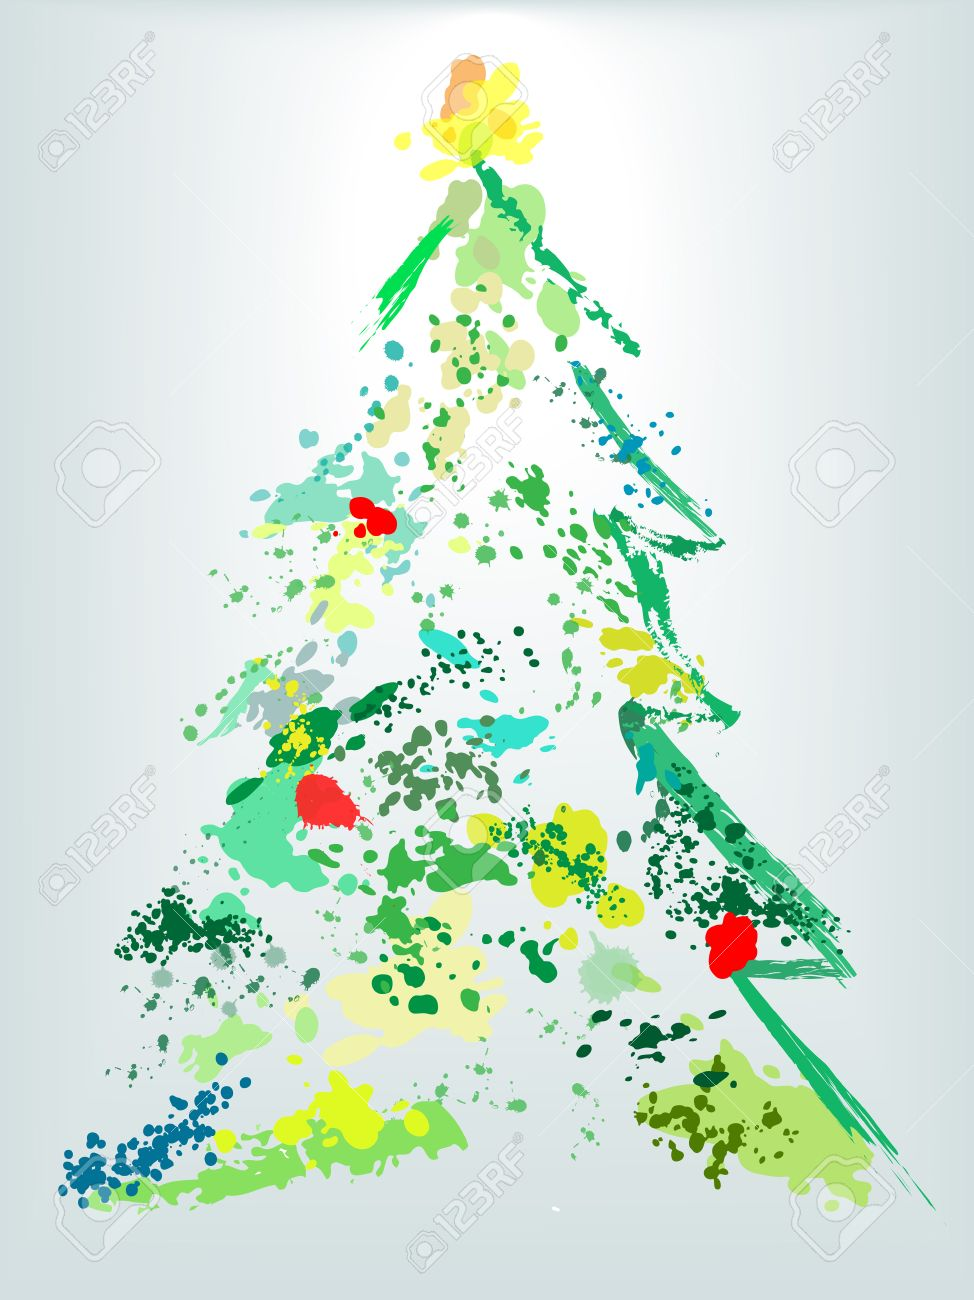 A Christmas Tree Splatter Shape Of Paint Drops As Decoration ...